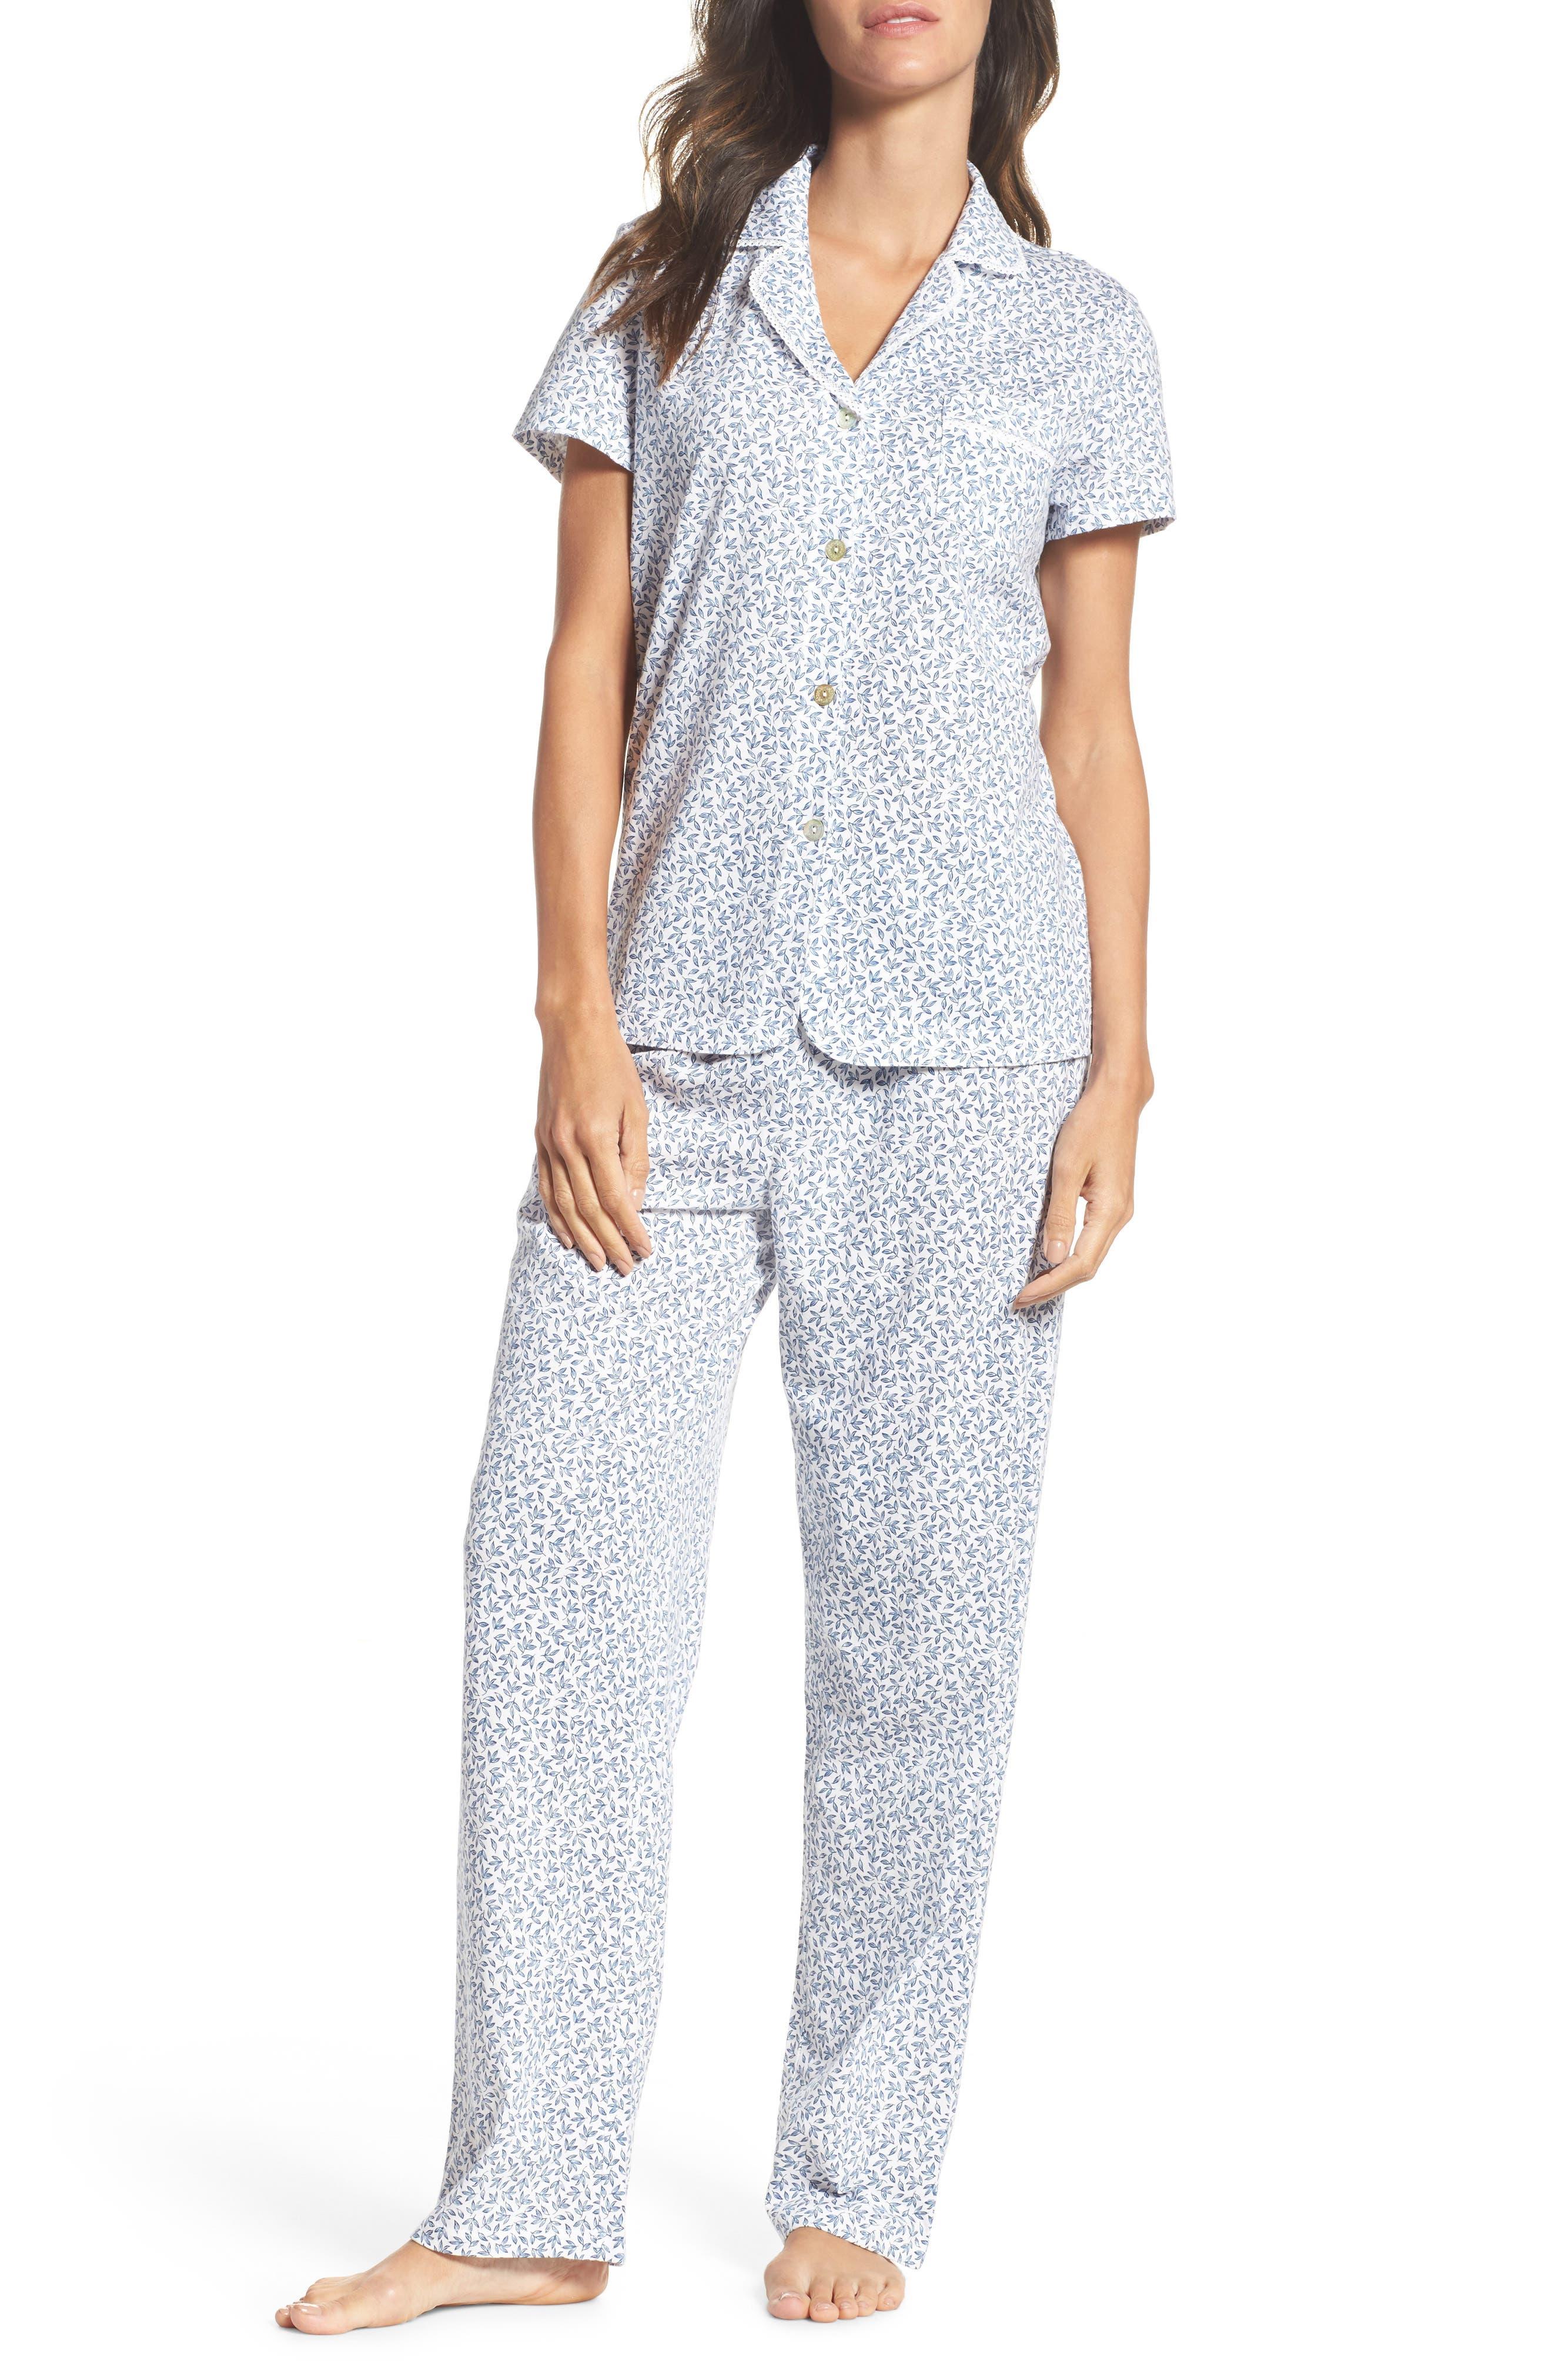 Alternate Image 1 Selected - Carole Hochman Print Jersey Pajamas